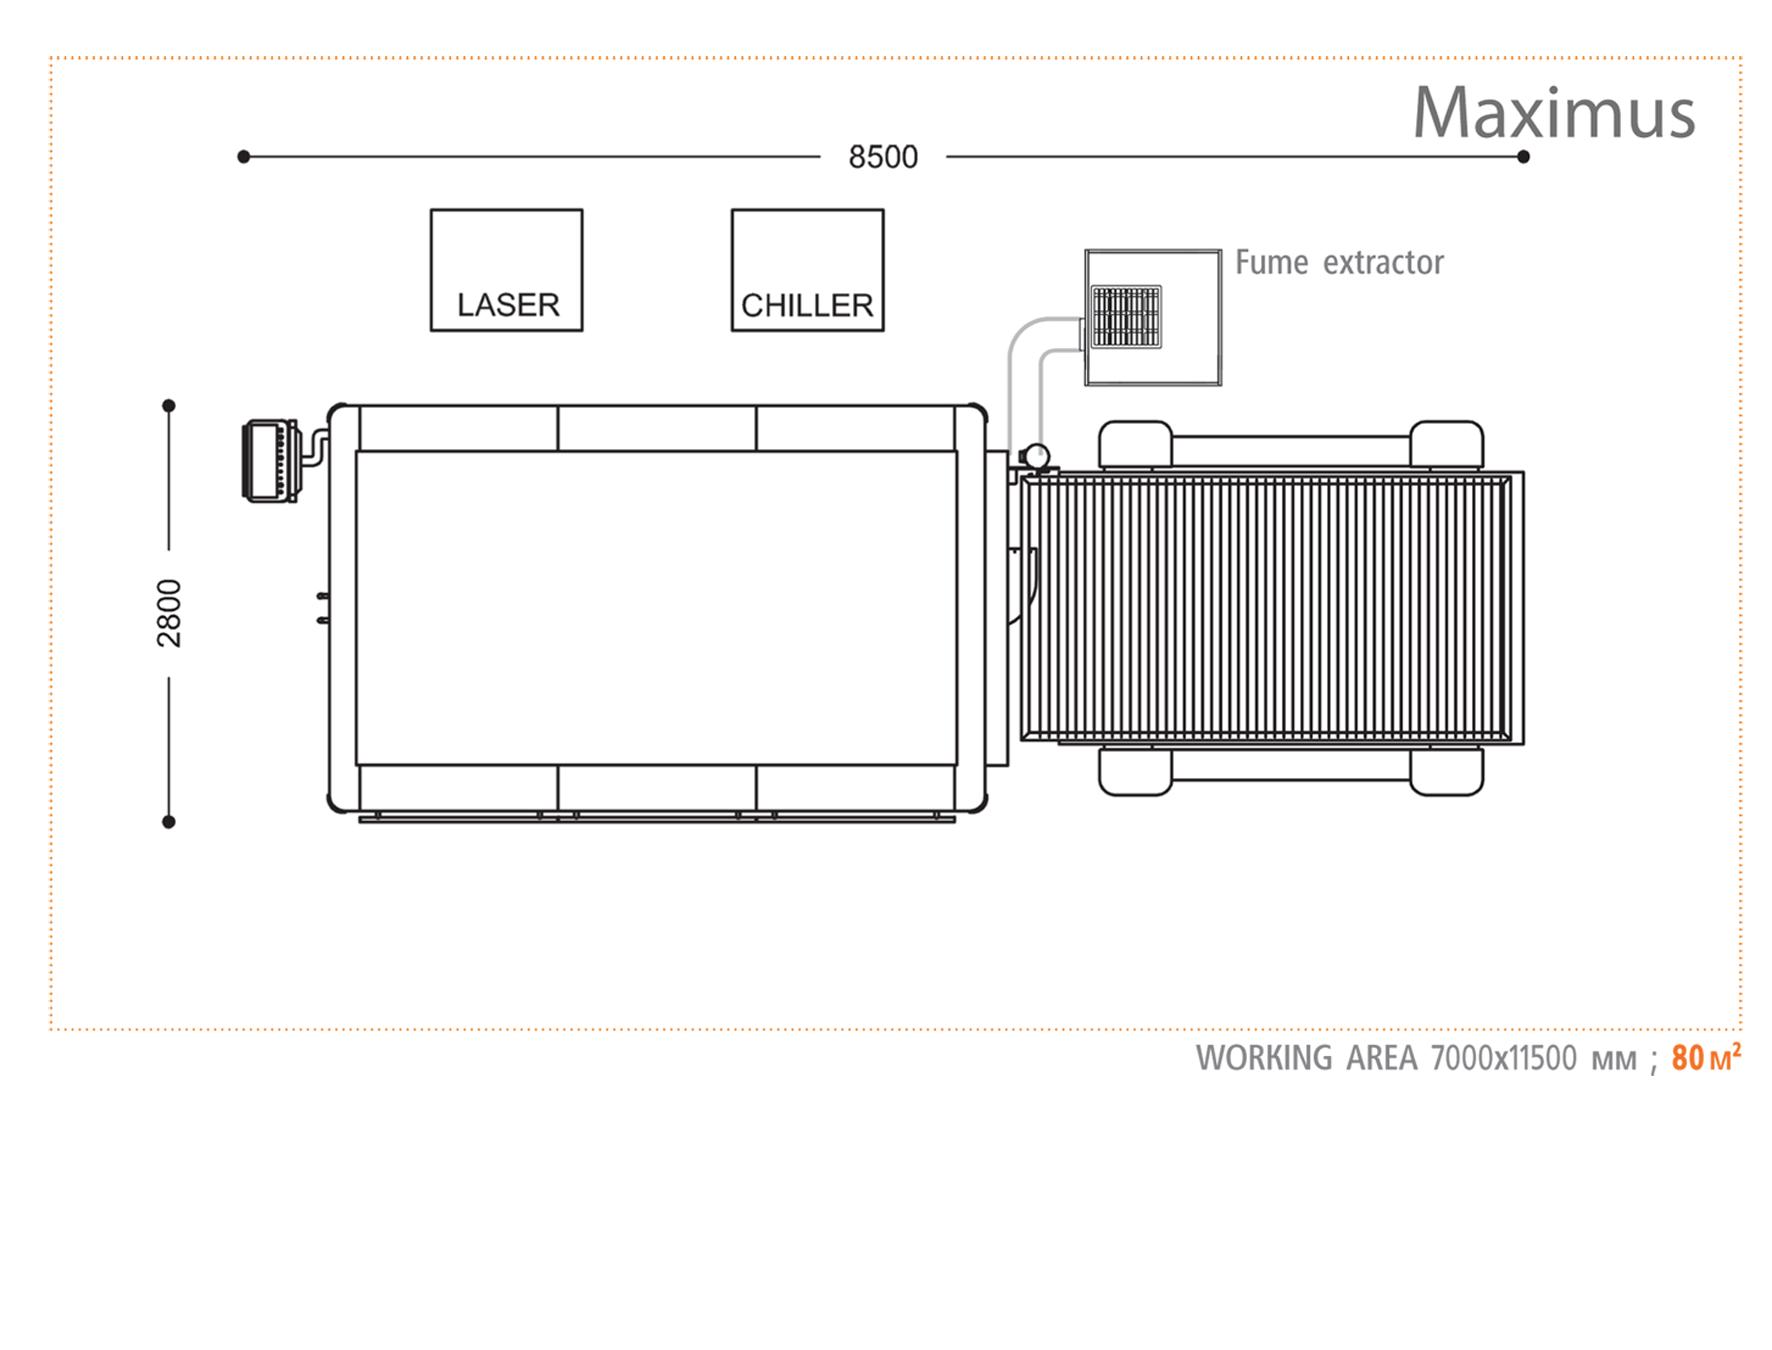 Maximus Isl Photonics 12 Lead Motor Wiring Diagram Iec Working Area 80m2